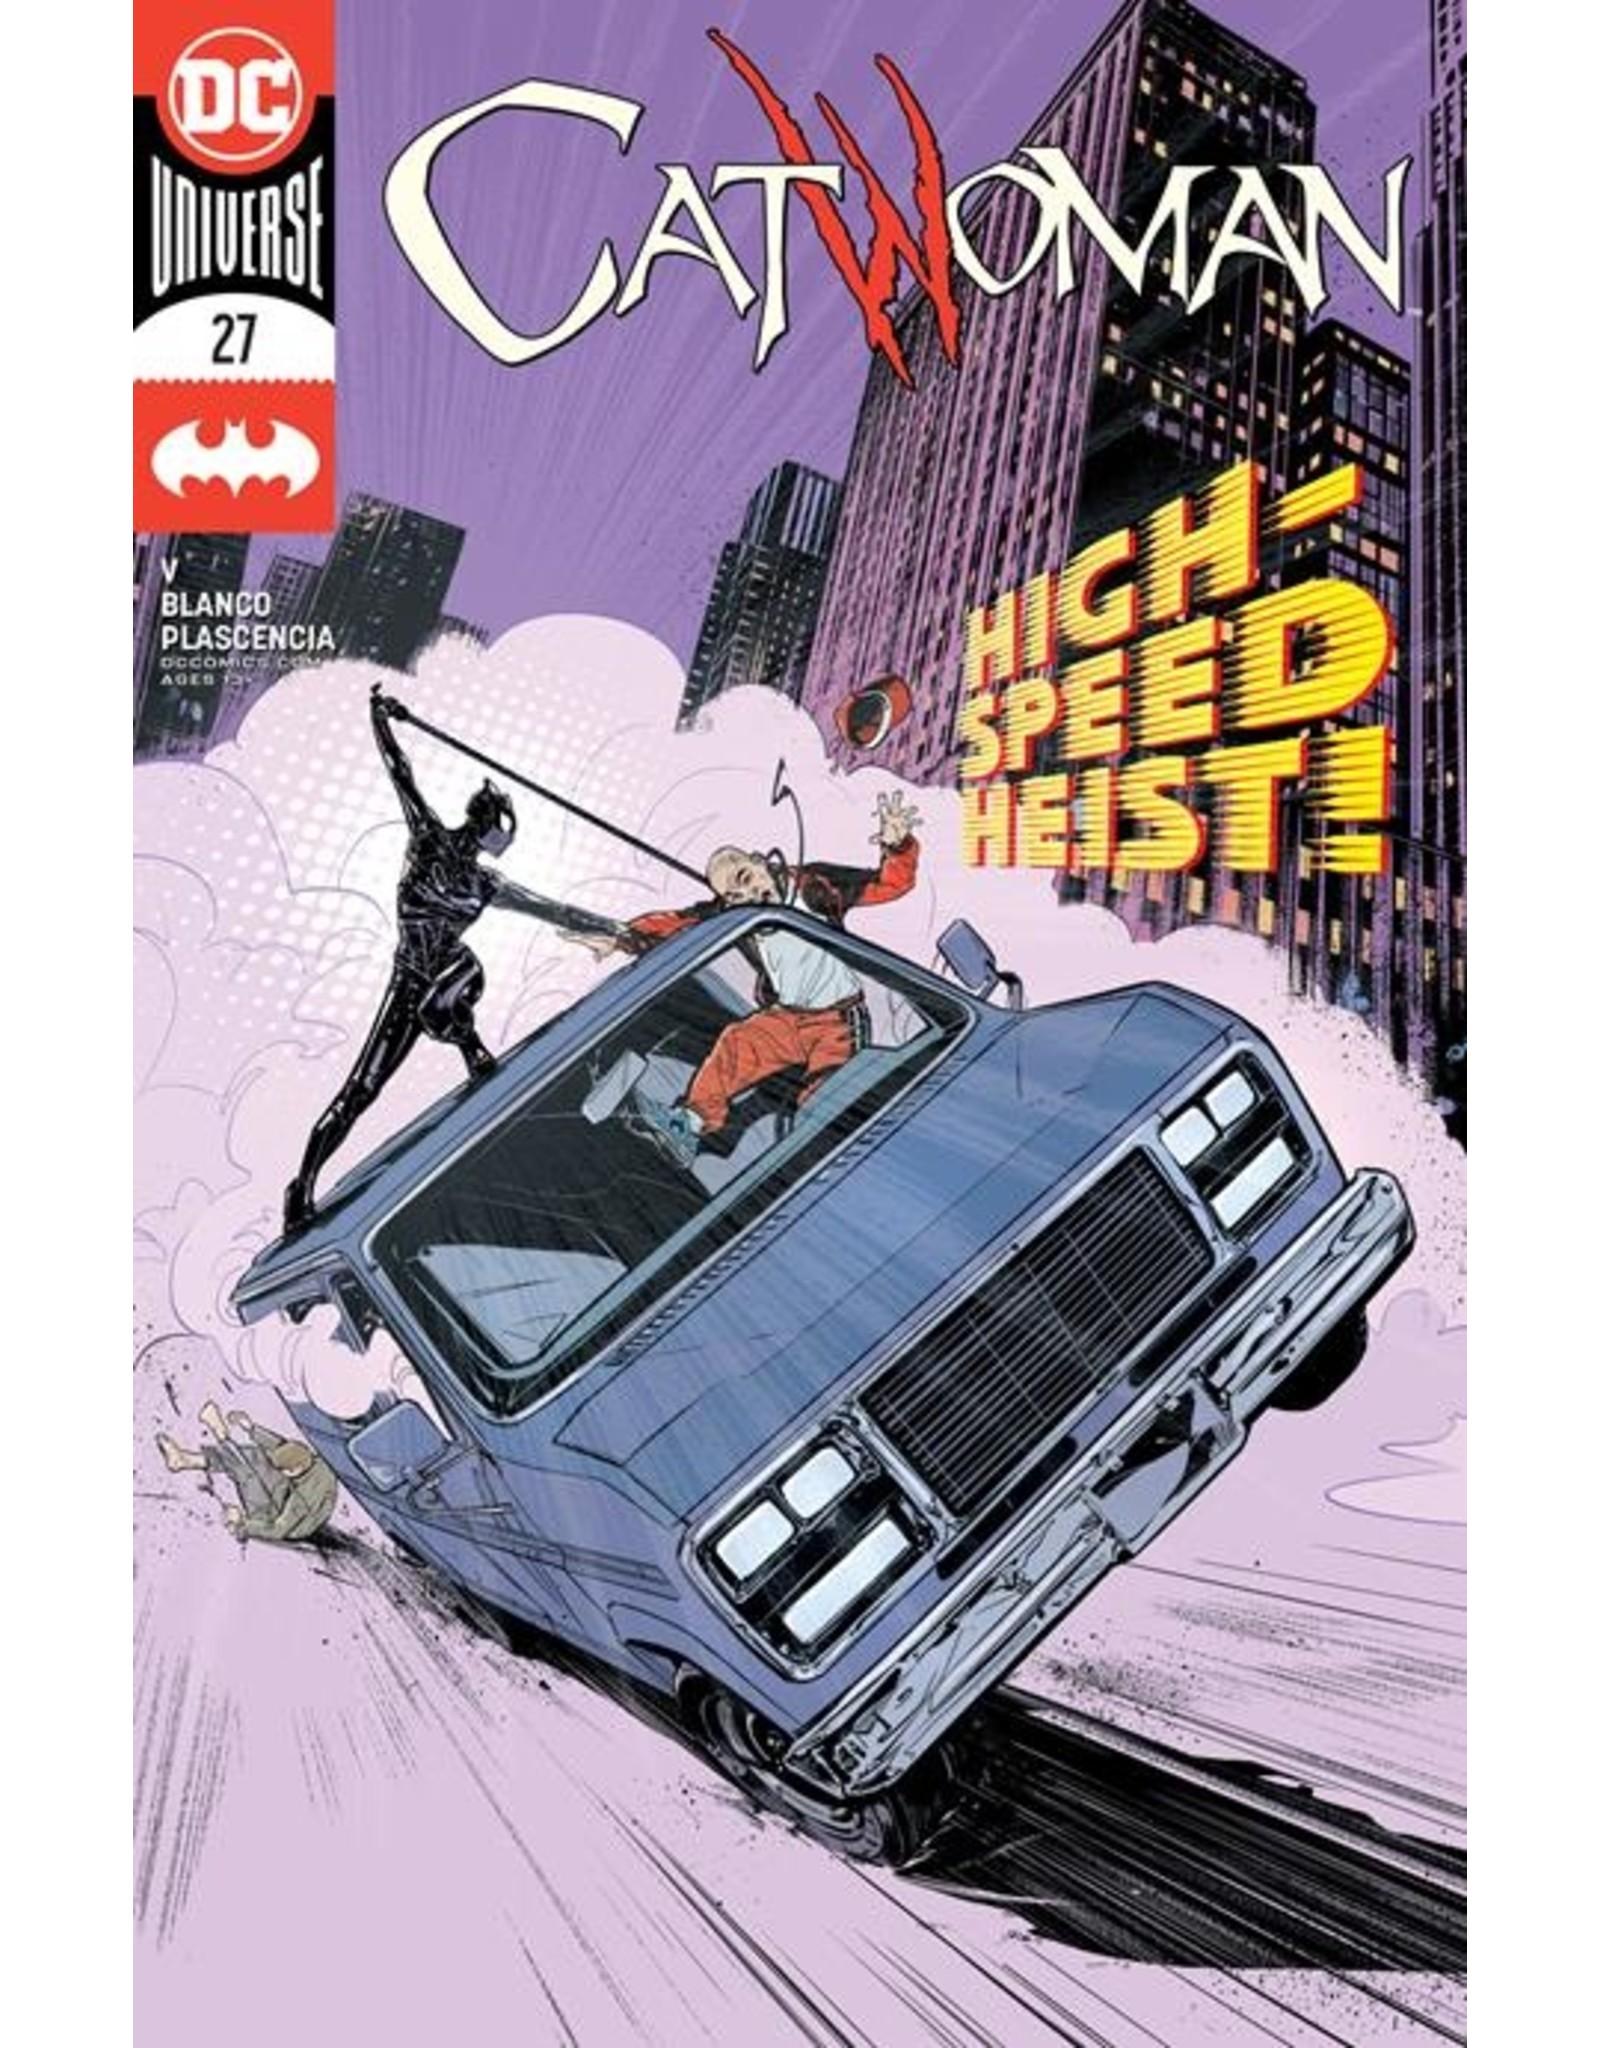 DC COMICS CATWOMAN #27 CVR A JOELLE JONES